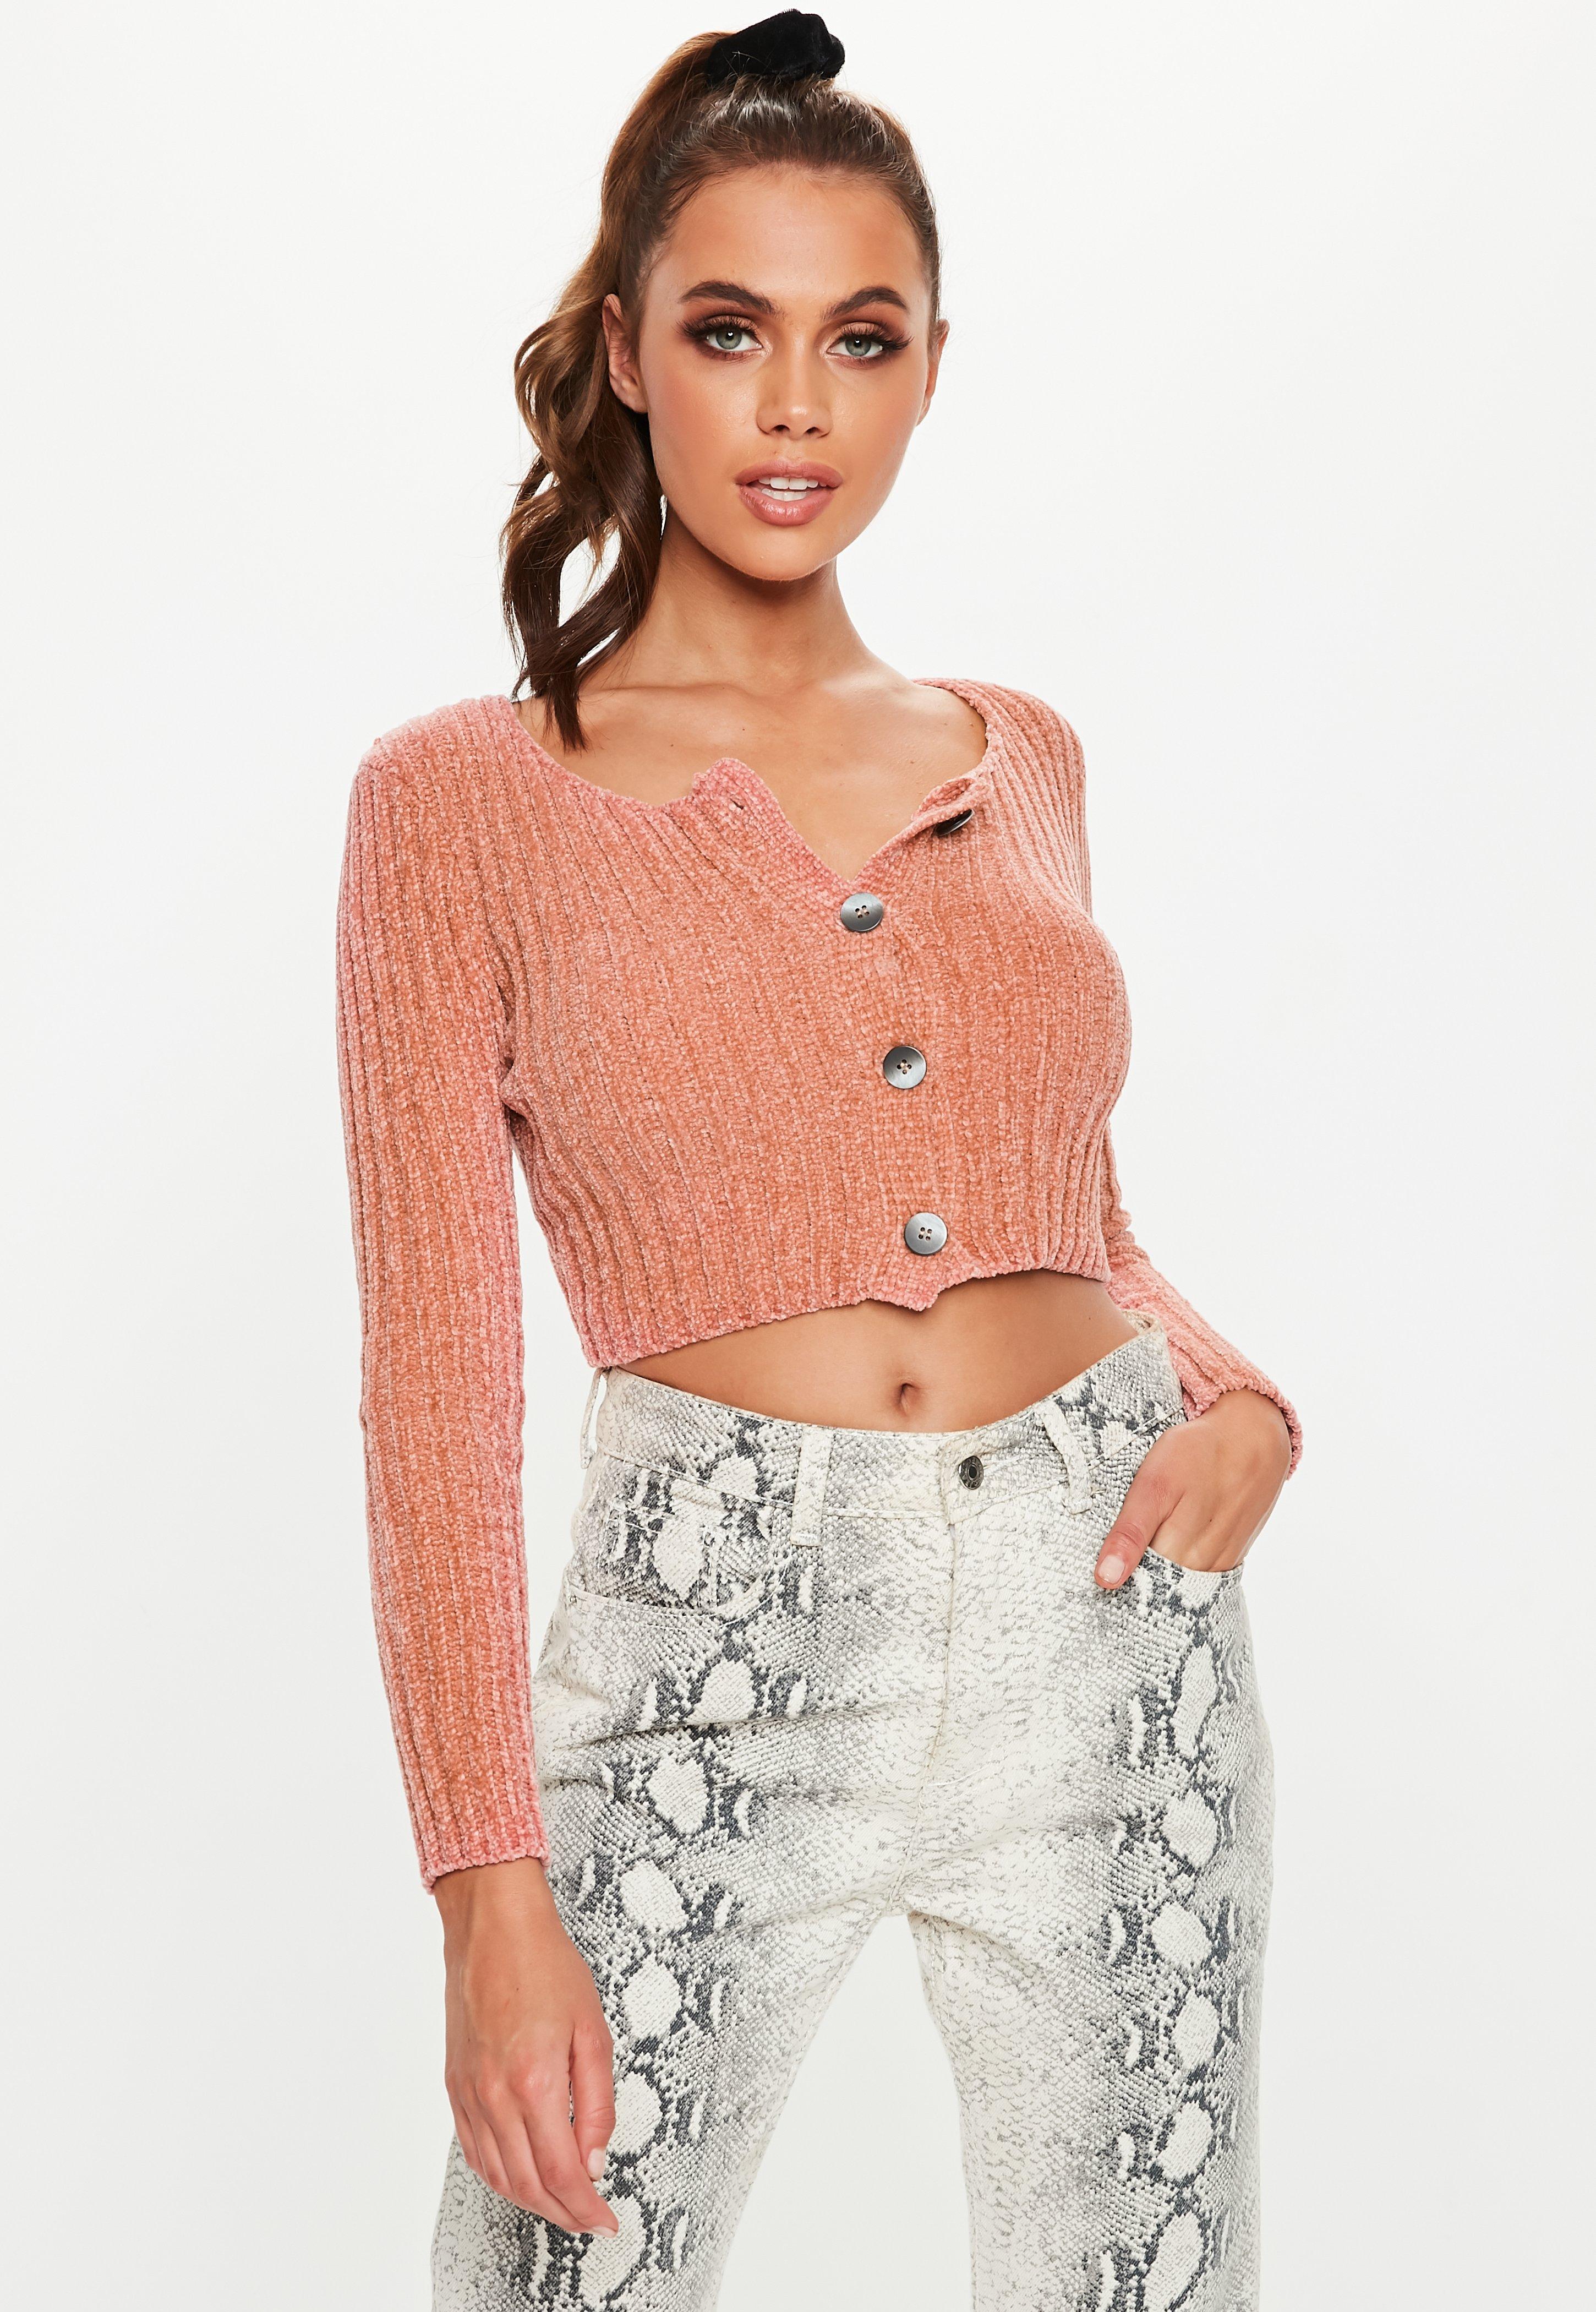 91241f3b47cbb1 Women s Cardigans - Crochet   Longline